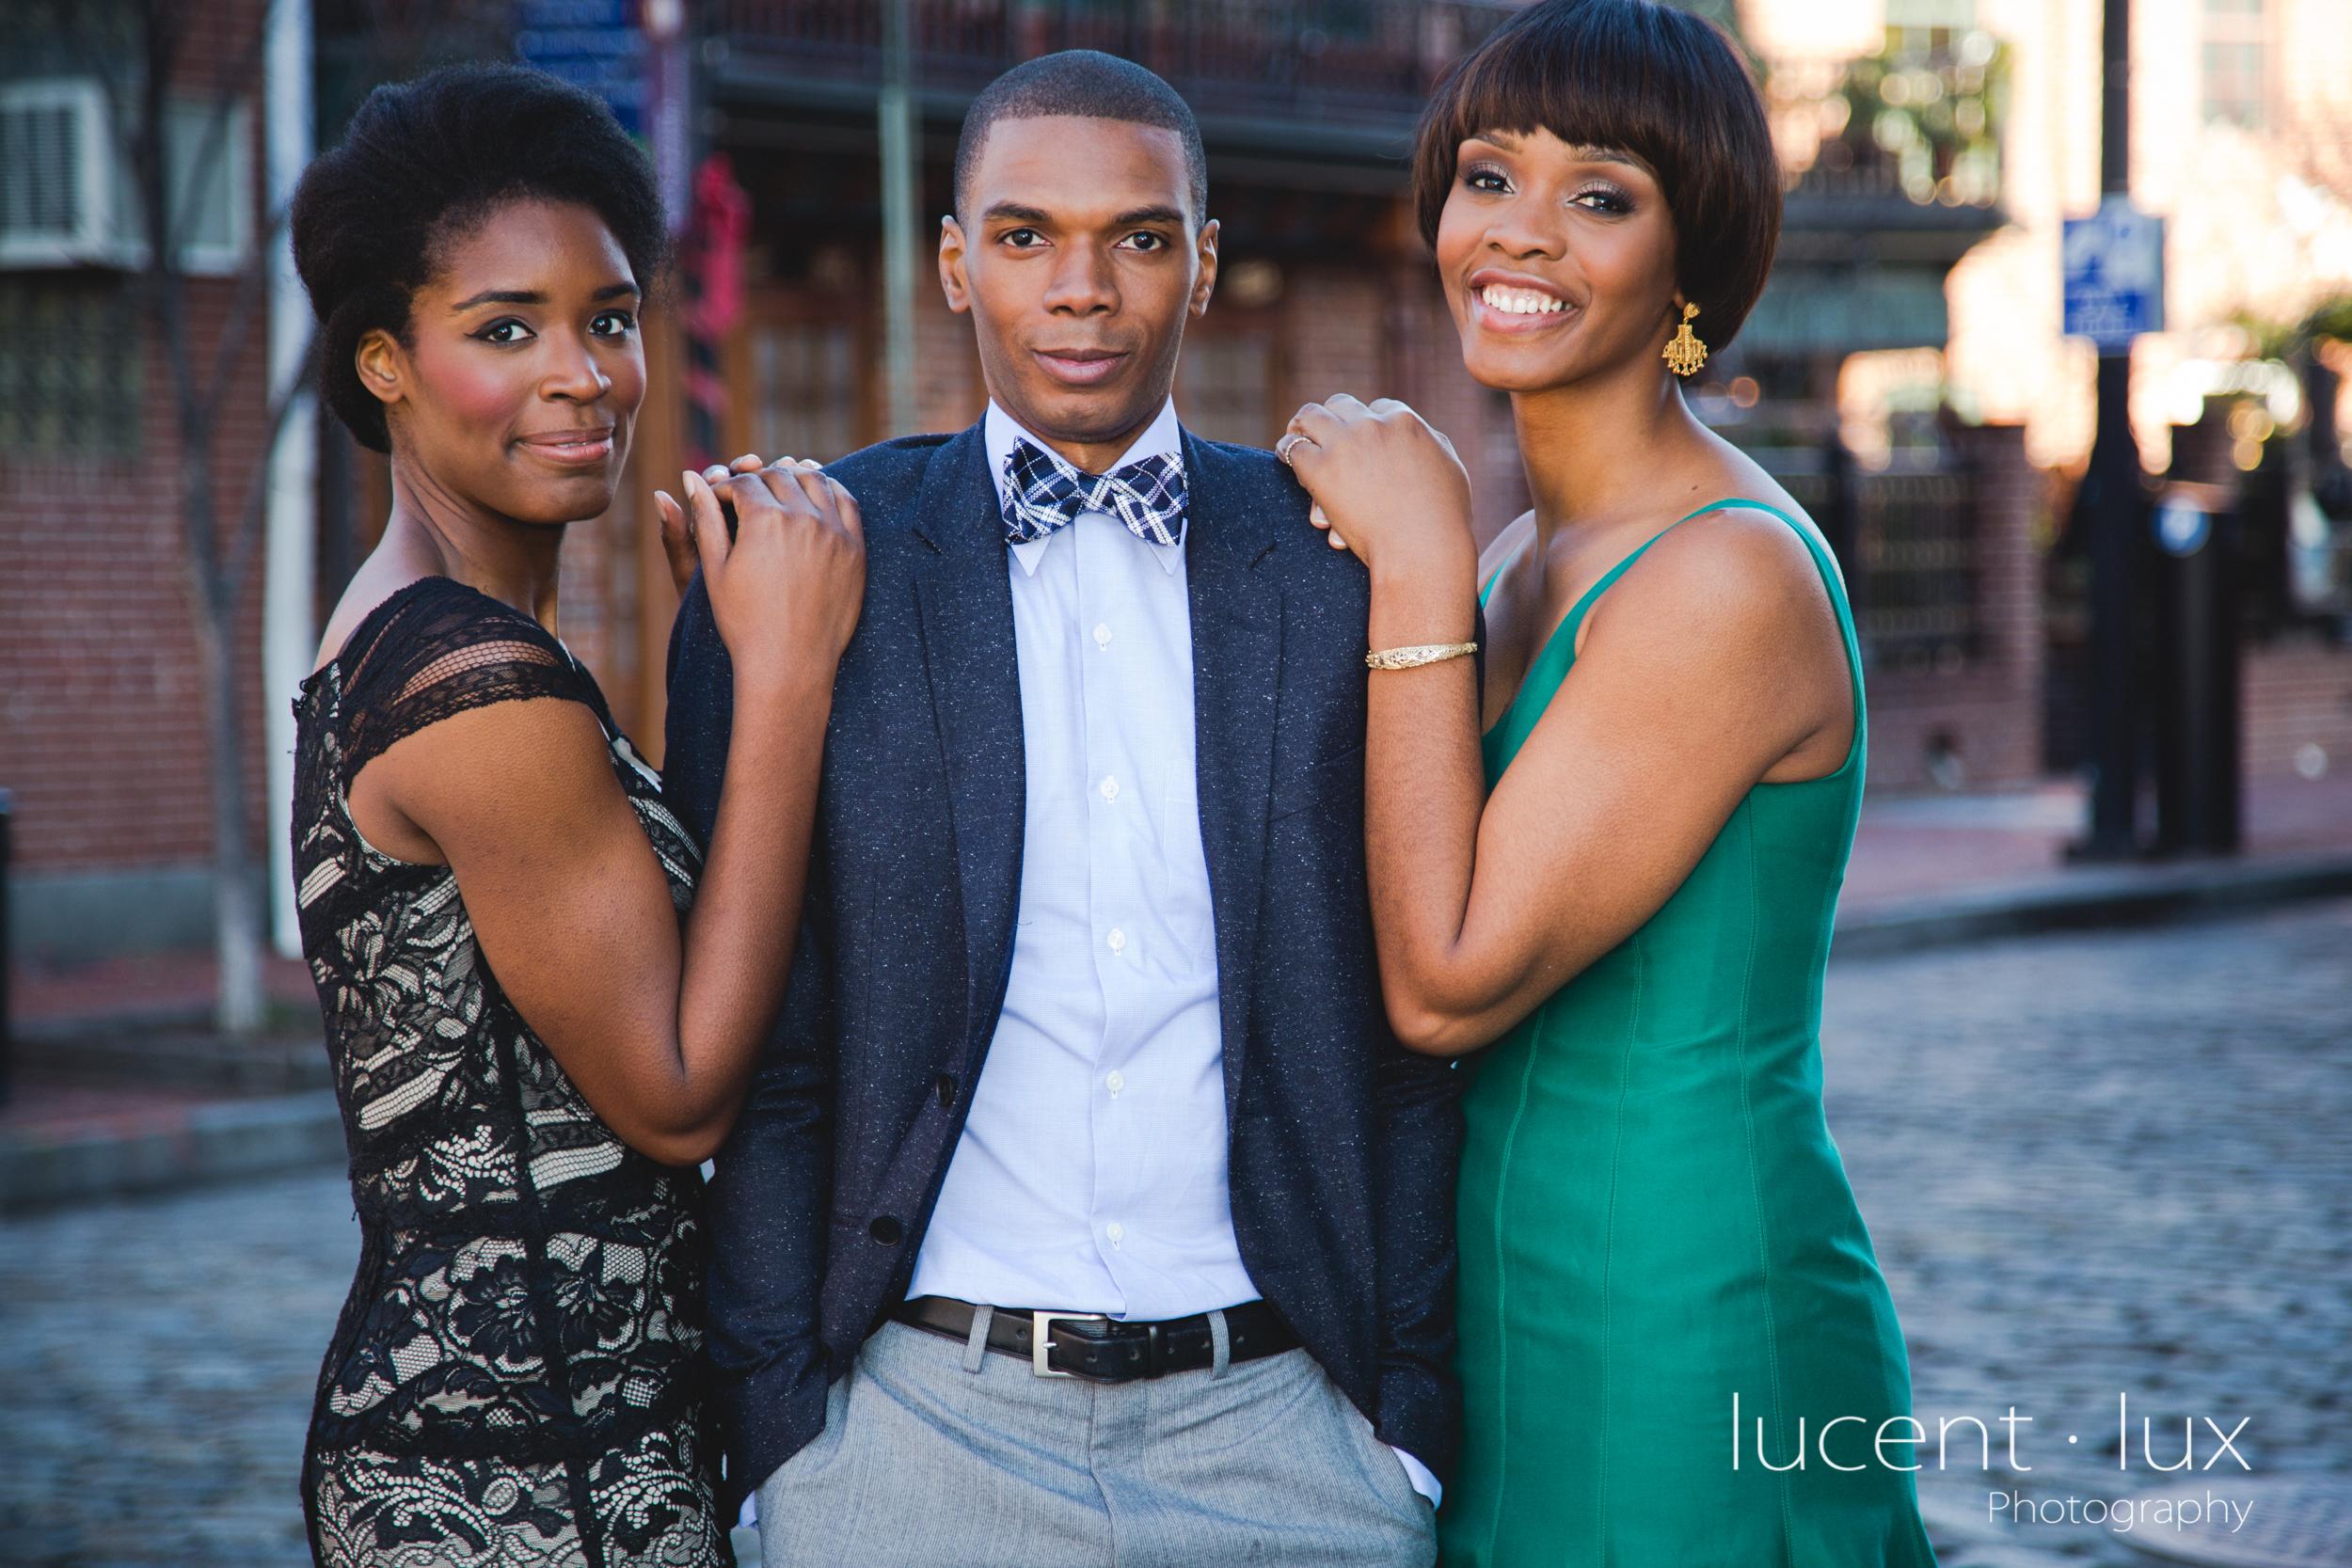 Fells-Point-Baltimore-Maryland-Photography-Photographer-Family-Portraits-Fells-Point-122.jpg